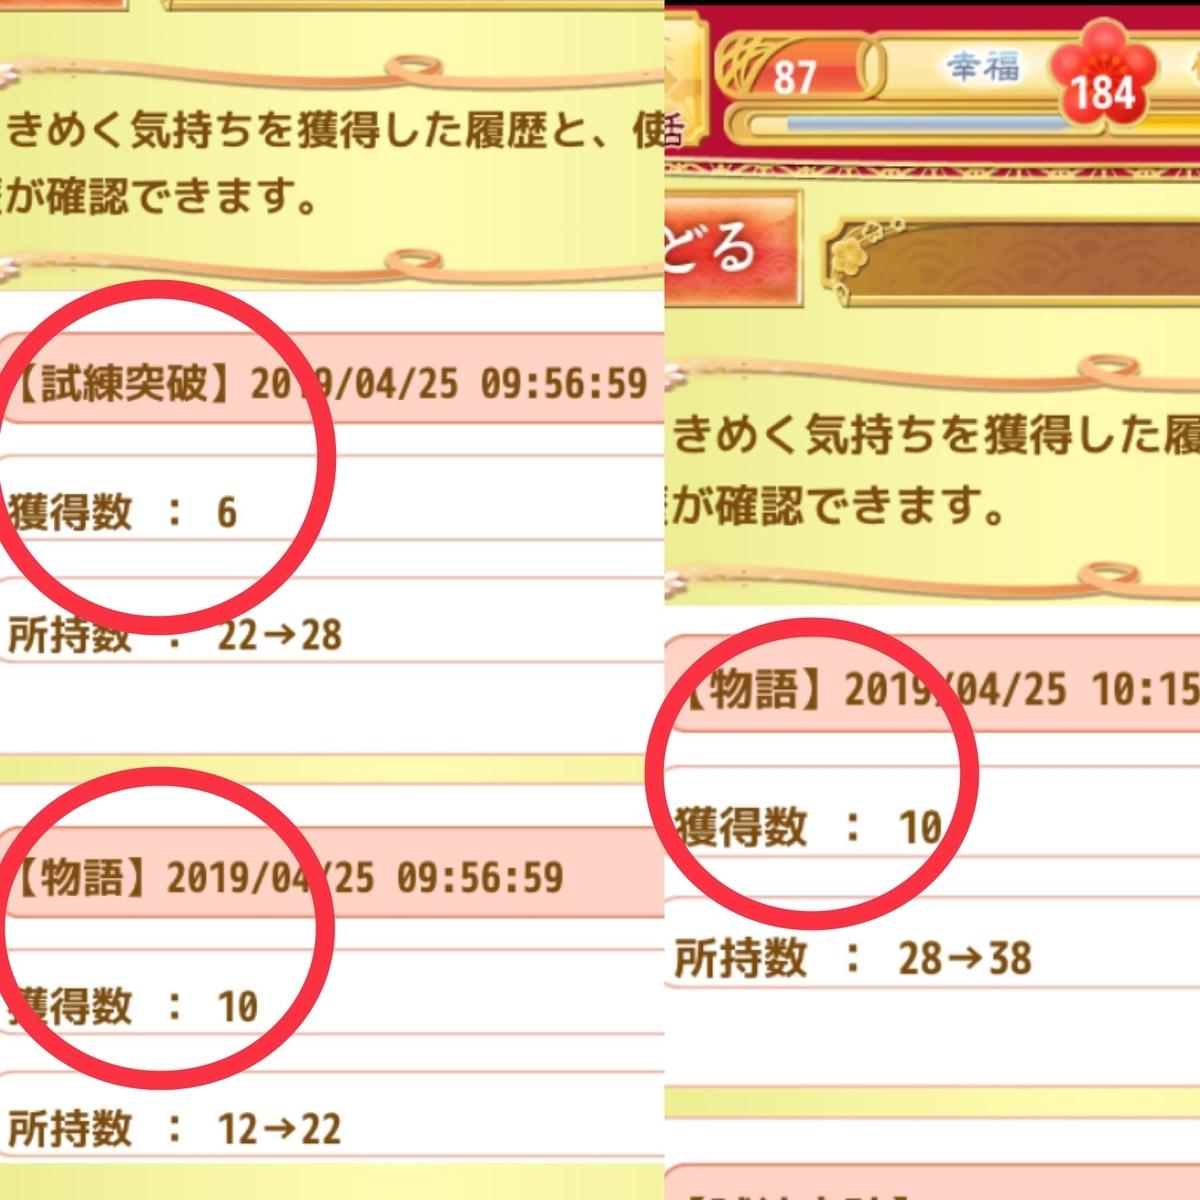 f:id:MIORI-NAGOYA-OWARINOKUNI:20190427164106j:plain